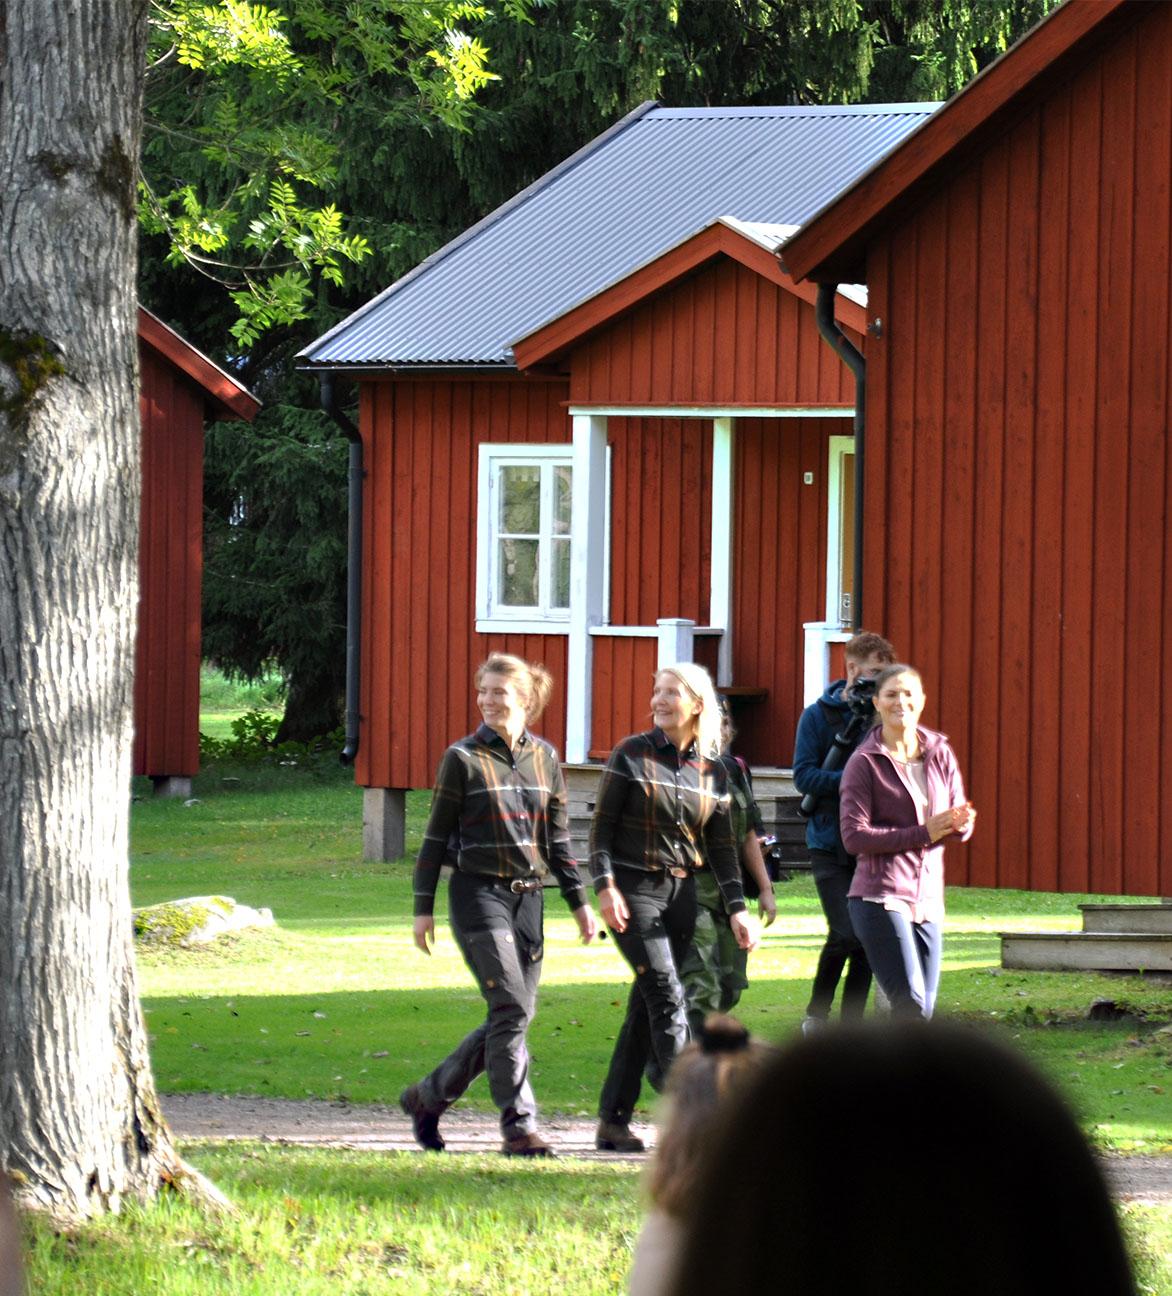 H.K.H. Kronprinzessin Sågarbo herrgård Beate Tjernström Sofia Tjernström